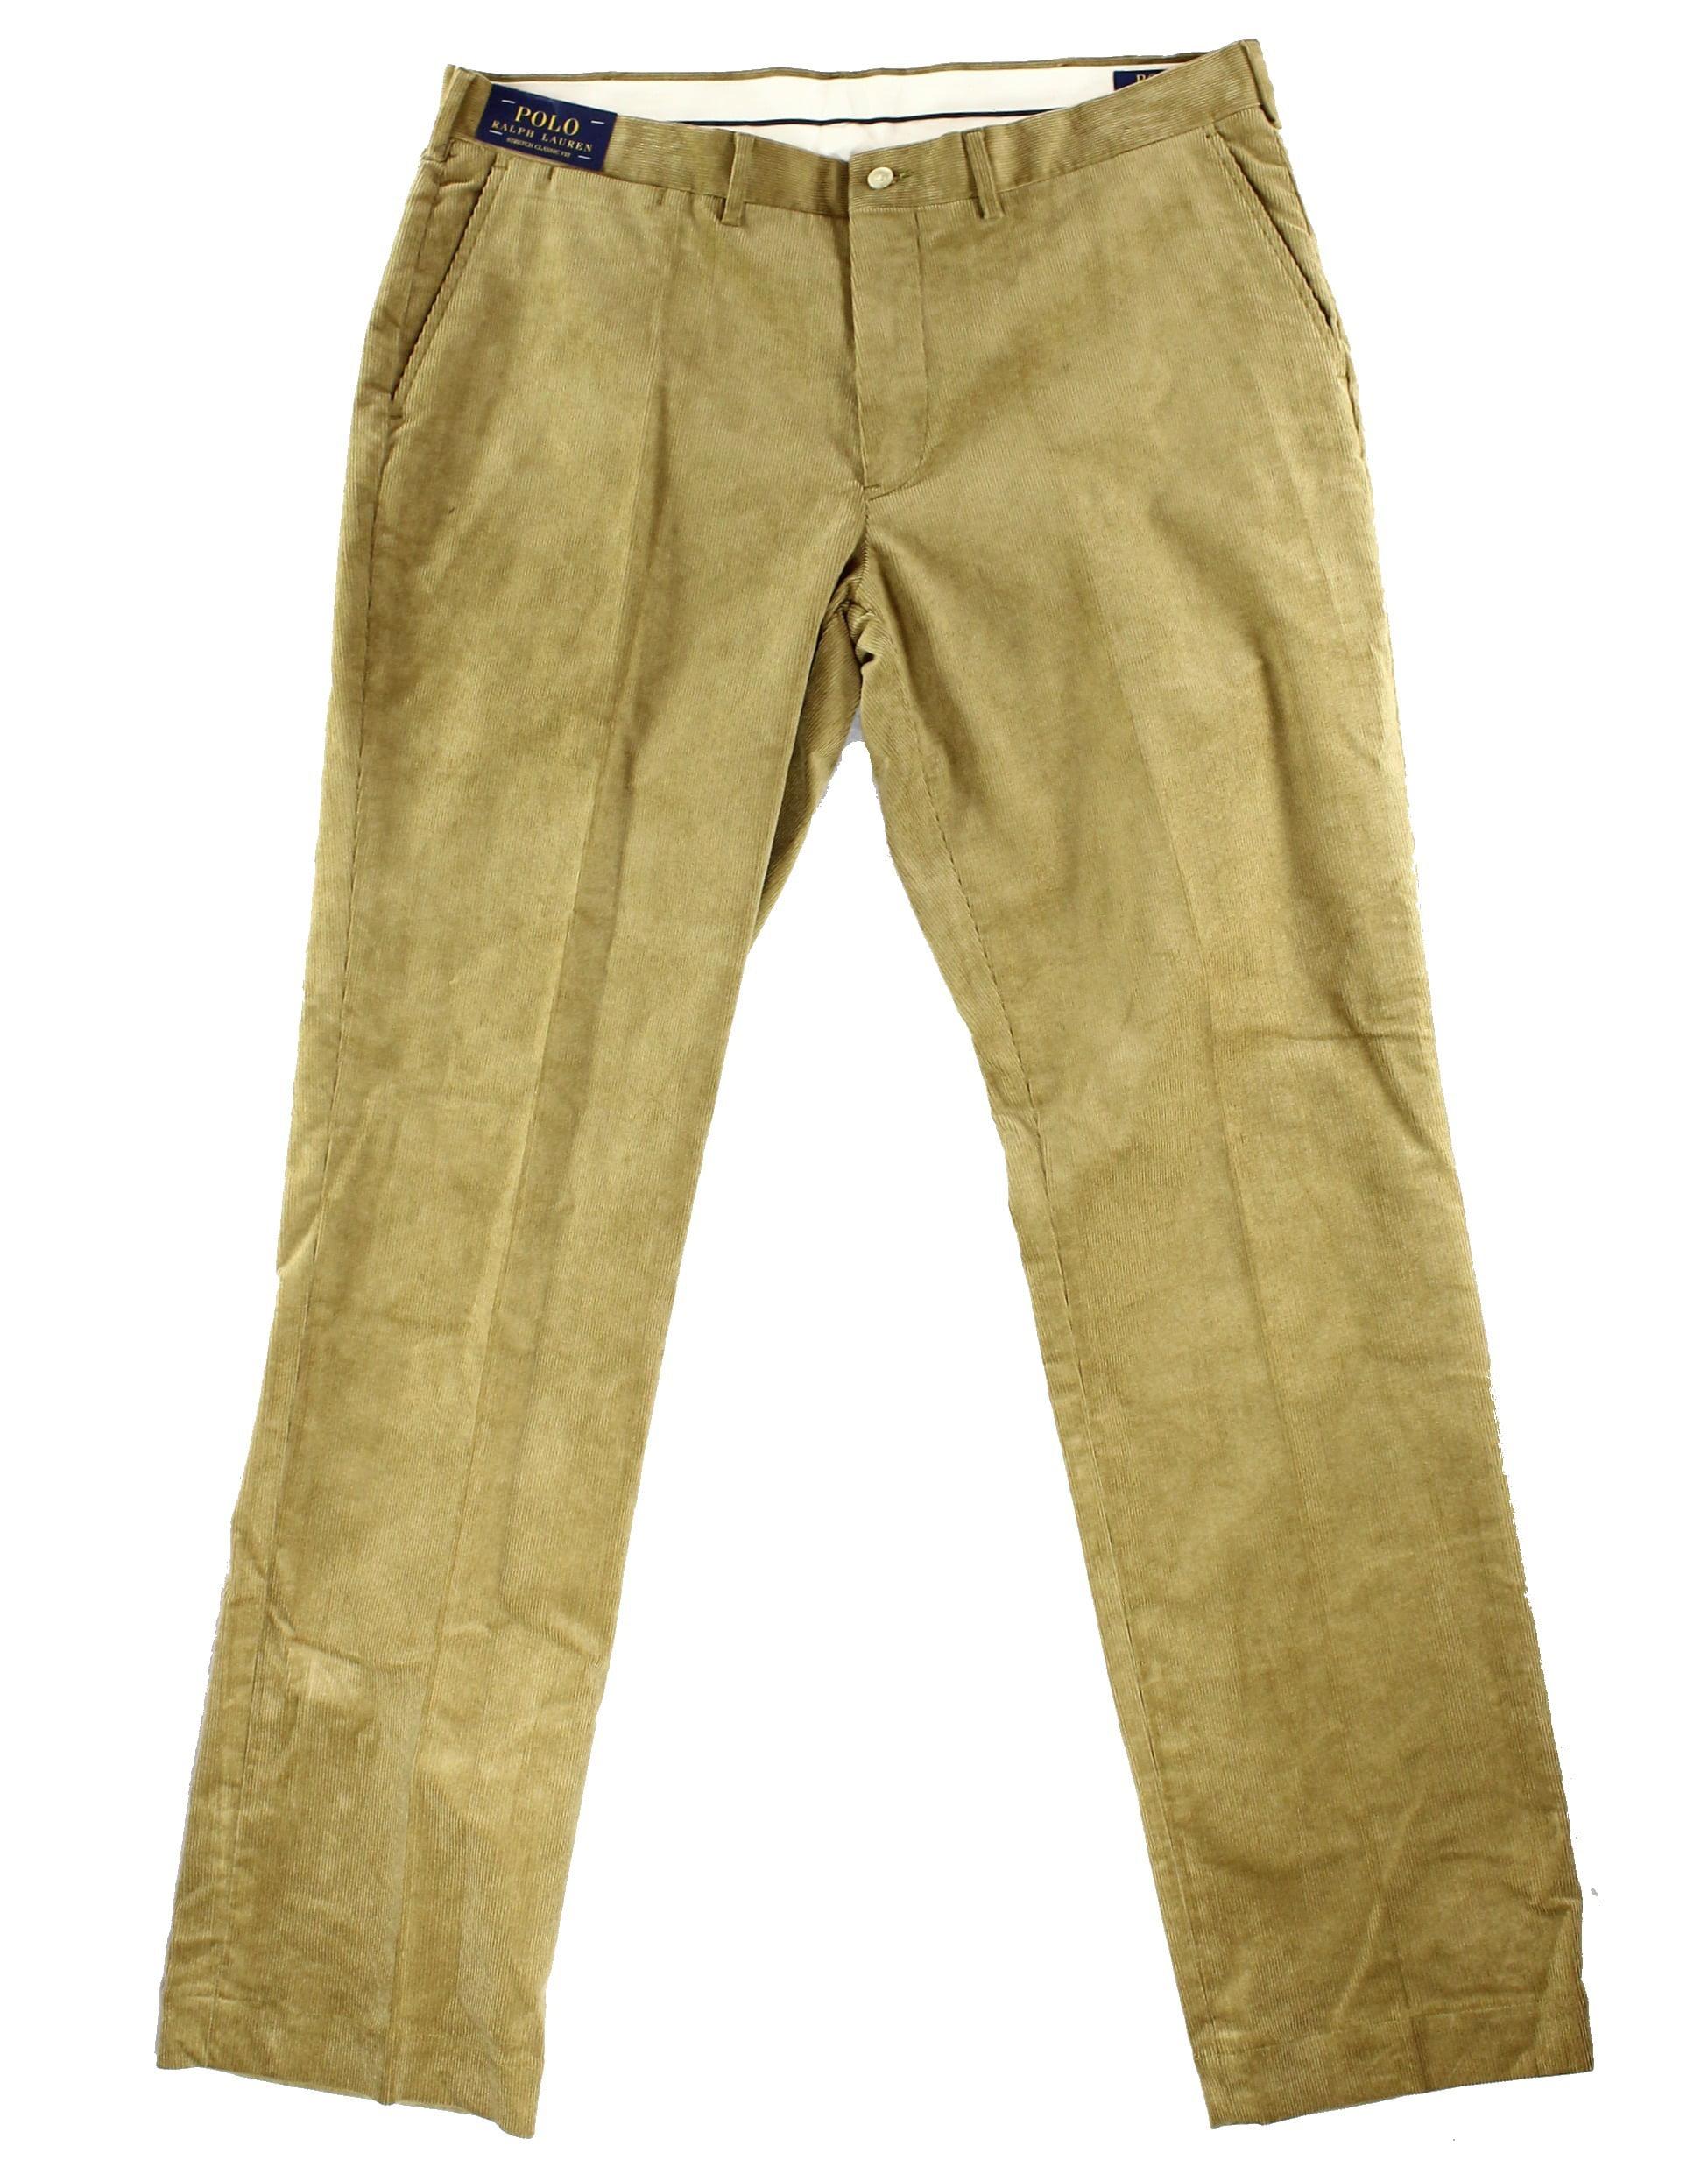 Polo Ralph Lauren NEW Beige Mens 34X34 Stretch Classic Corduroys Pants